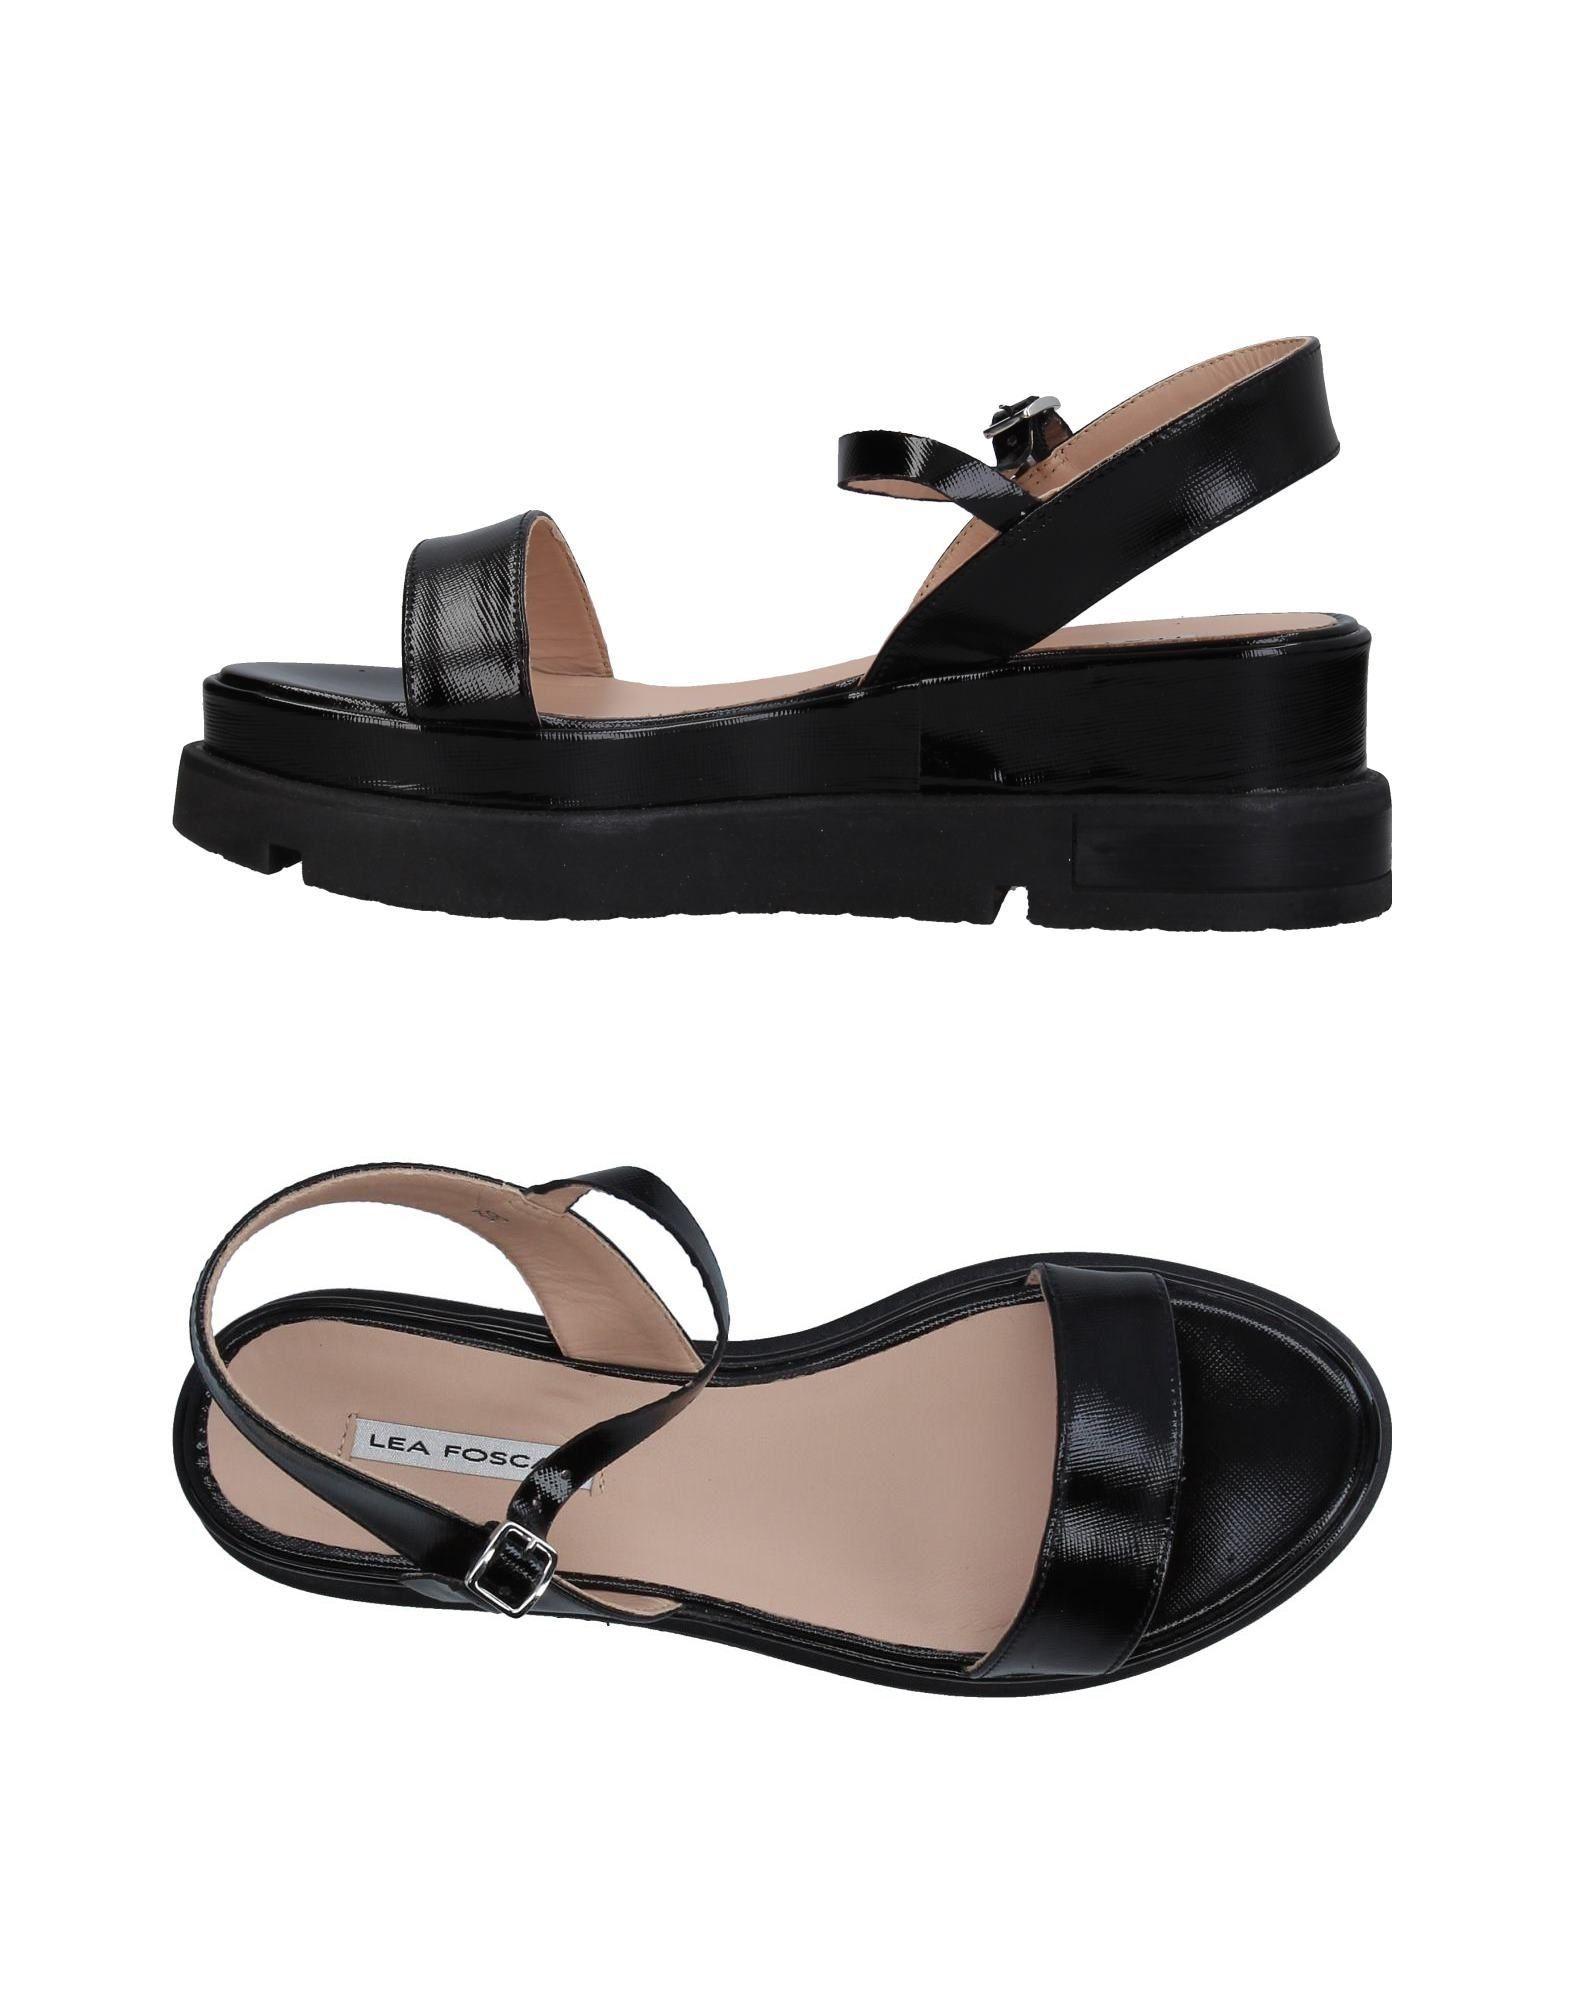 Lea Foscati Sandals Shop At Ebates